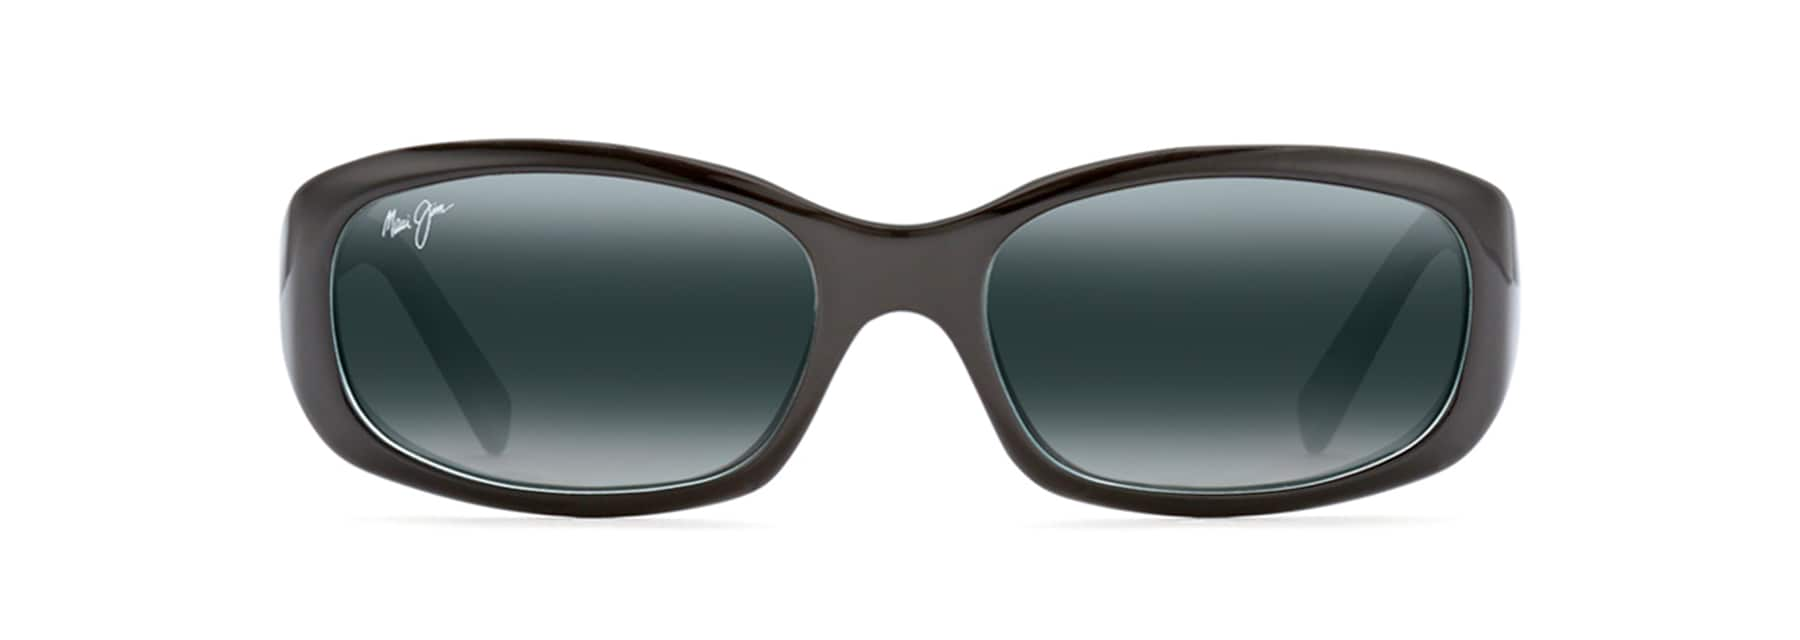 Polarised Polarised Punchbowl Jim® SunglassesMaui SunglassesMaui Punchbowl F1cKlJ